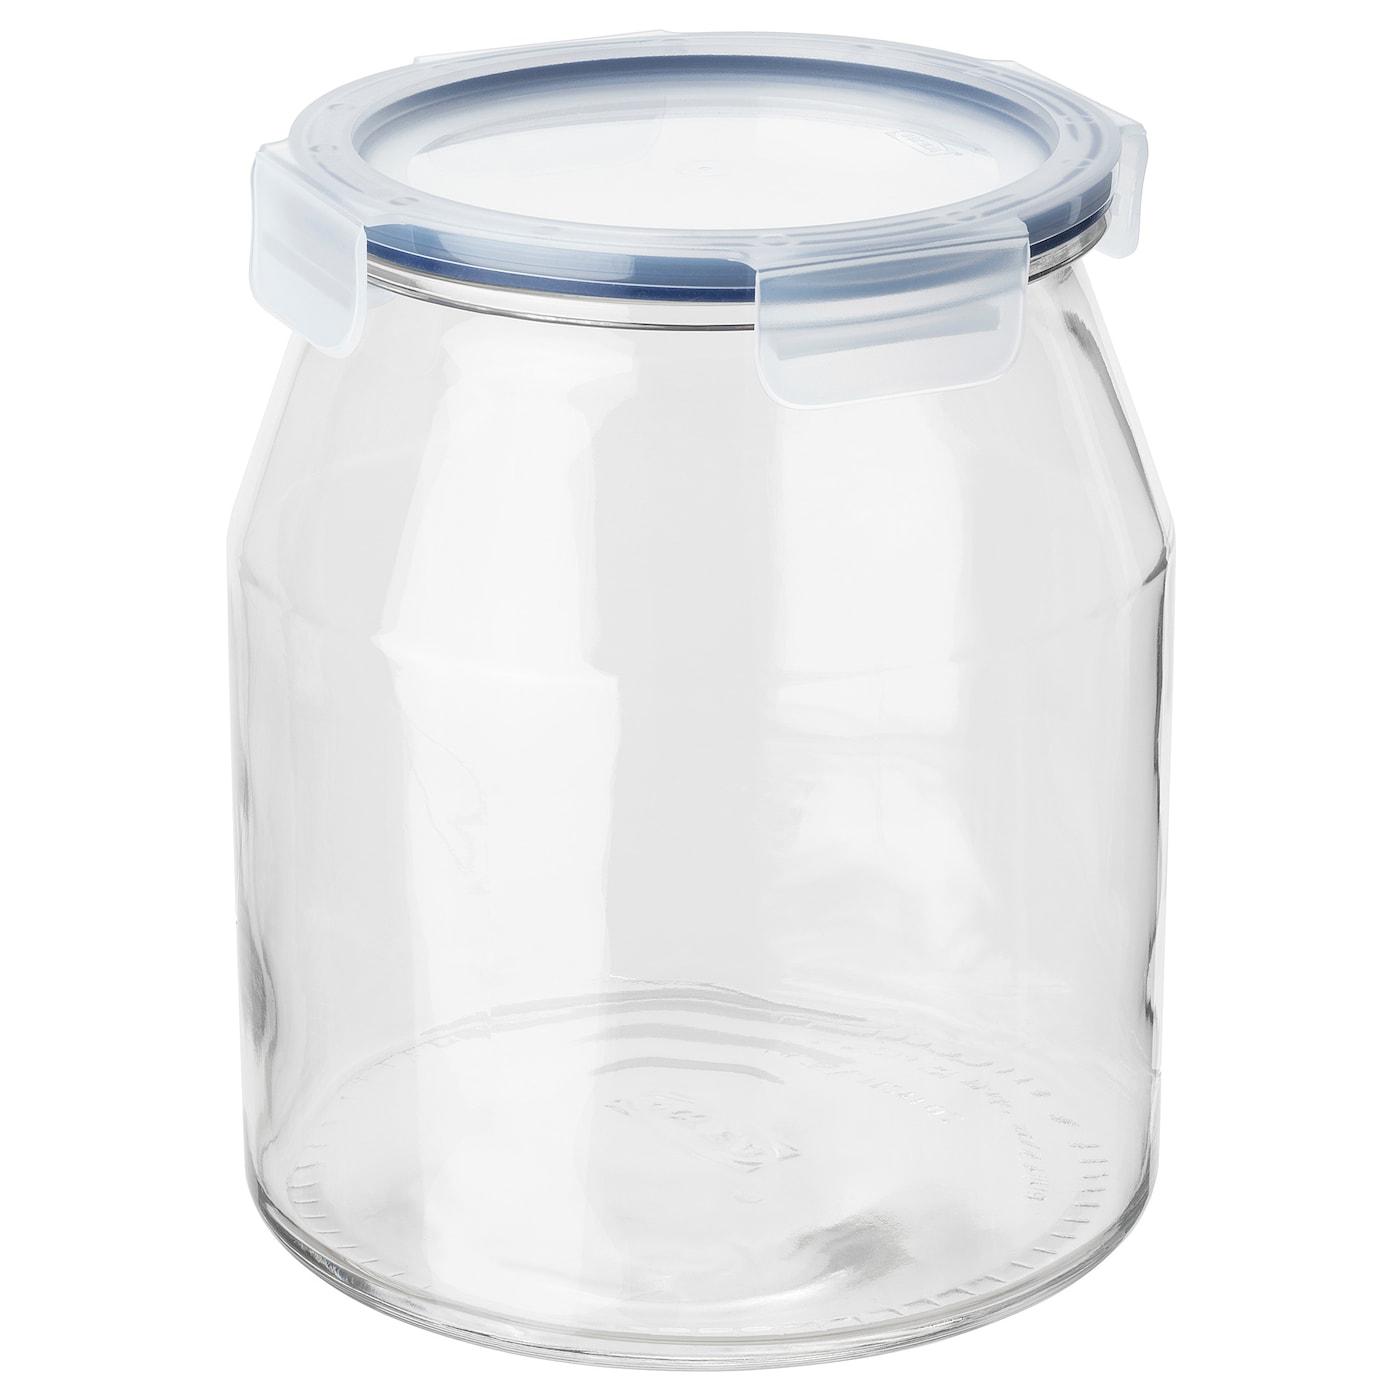 Ikea 365 Jar With Lid Gl Plastic